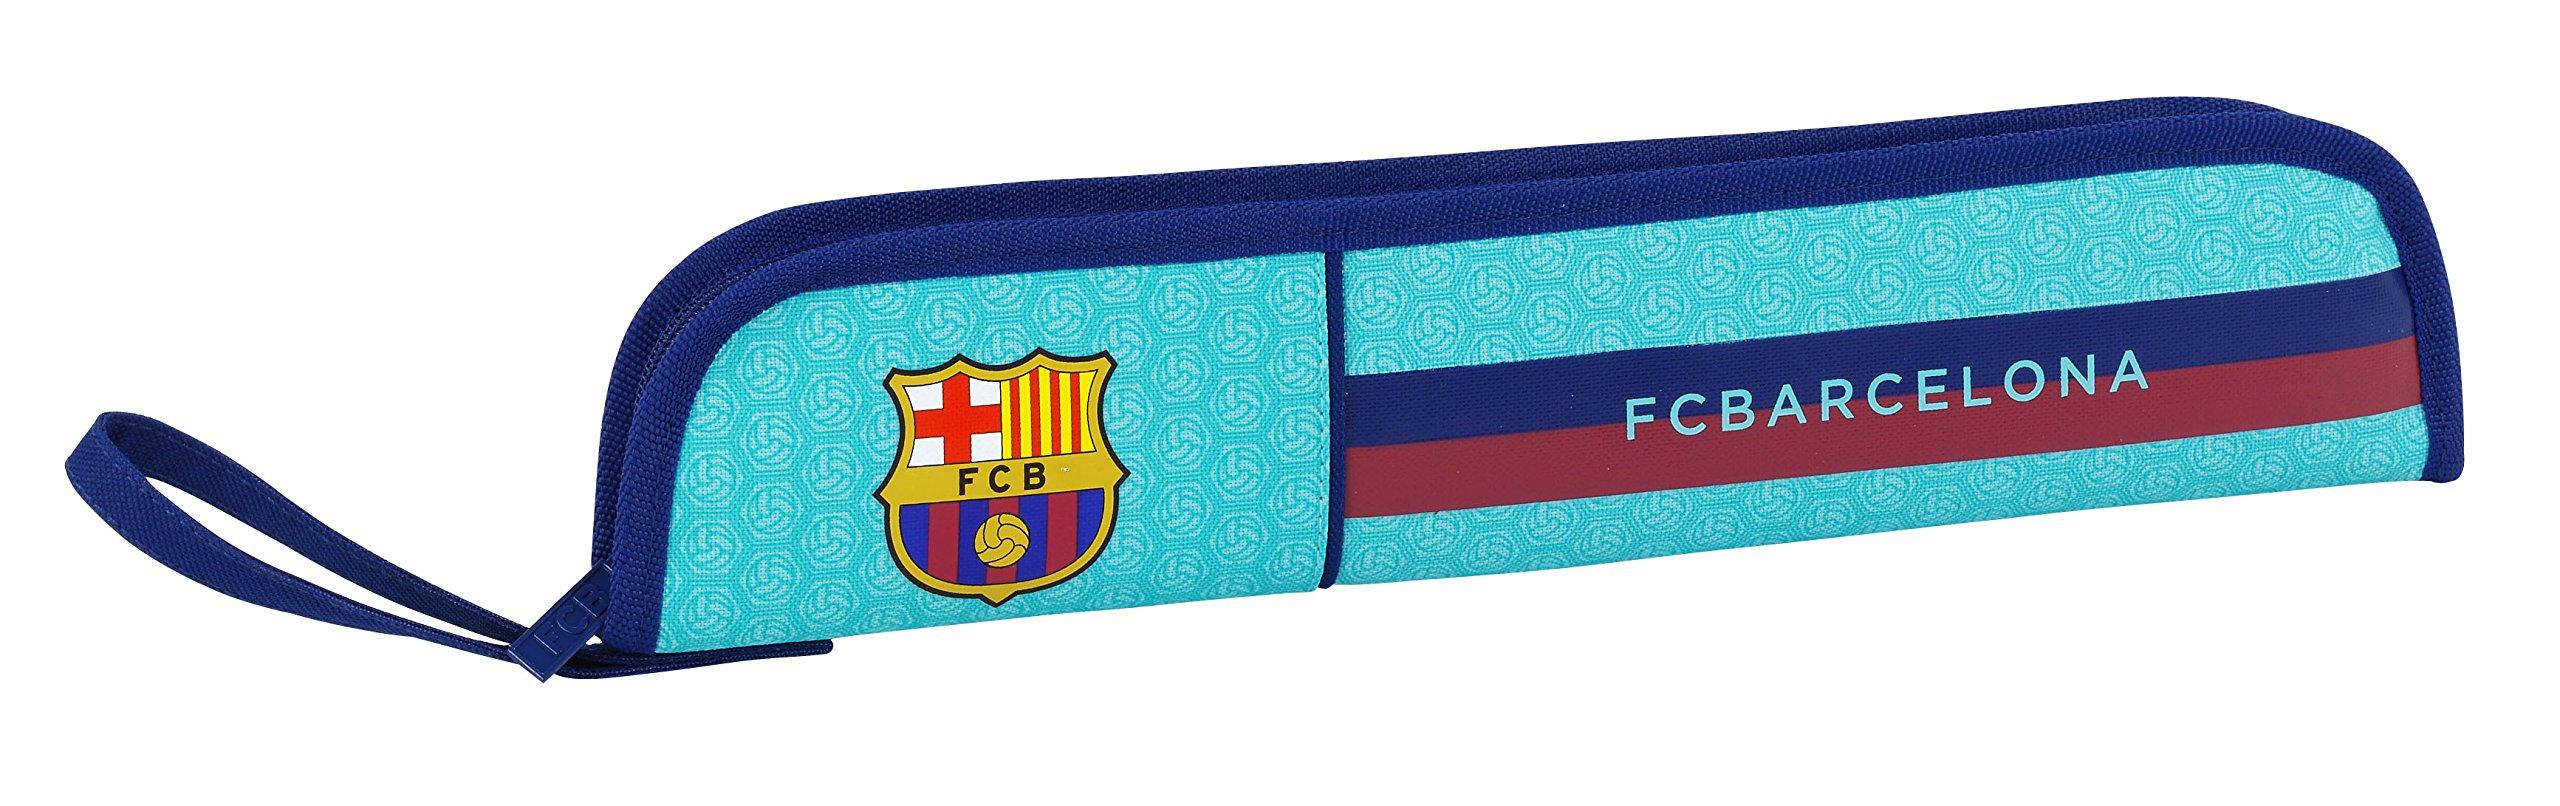 Safta Portaflautas F.C. Barcelona 2ª Equipacion 17/18 Oficial Protector Flauta 370x20x80mm